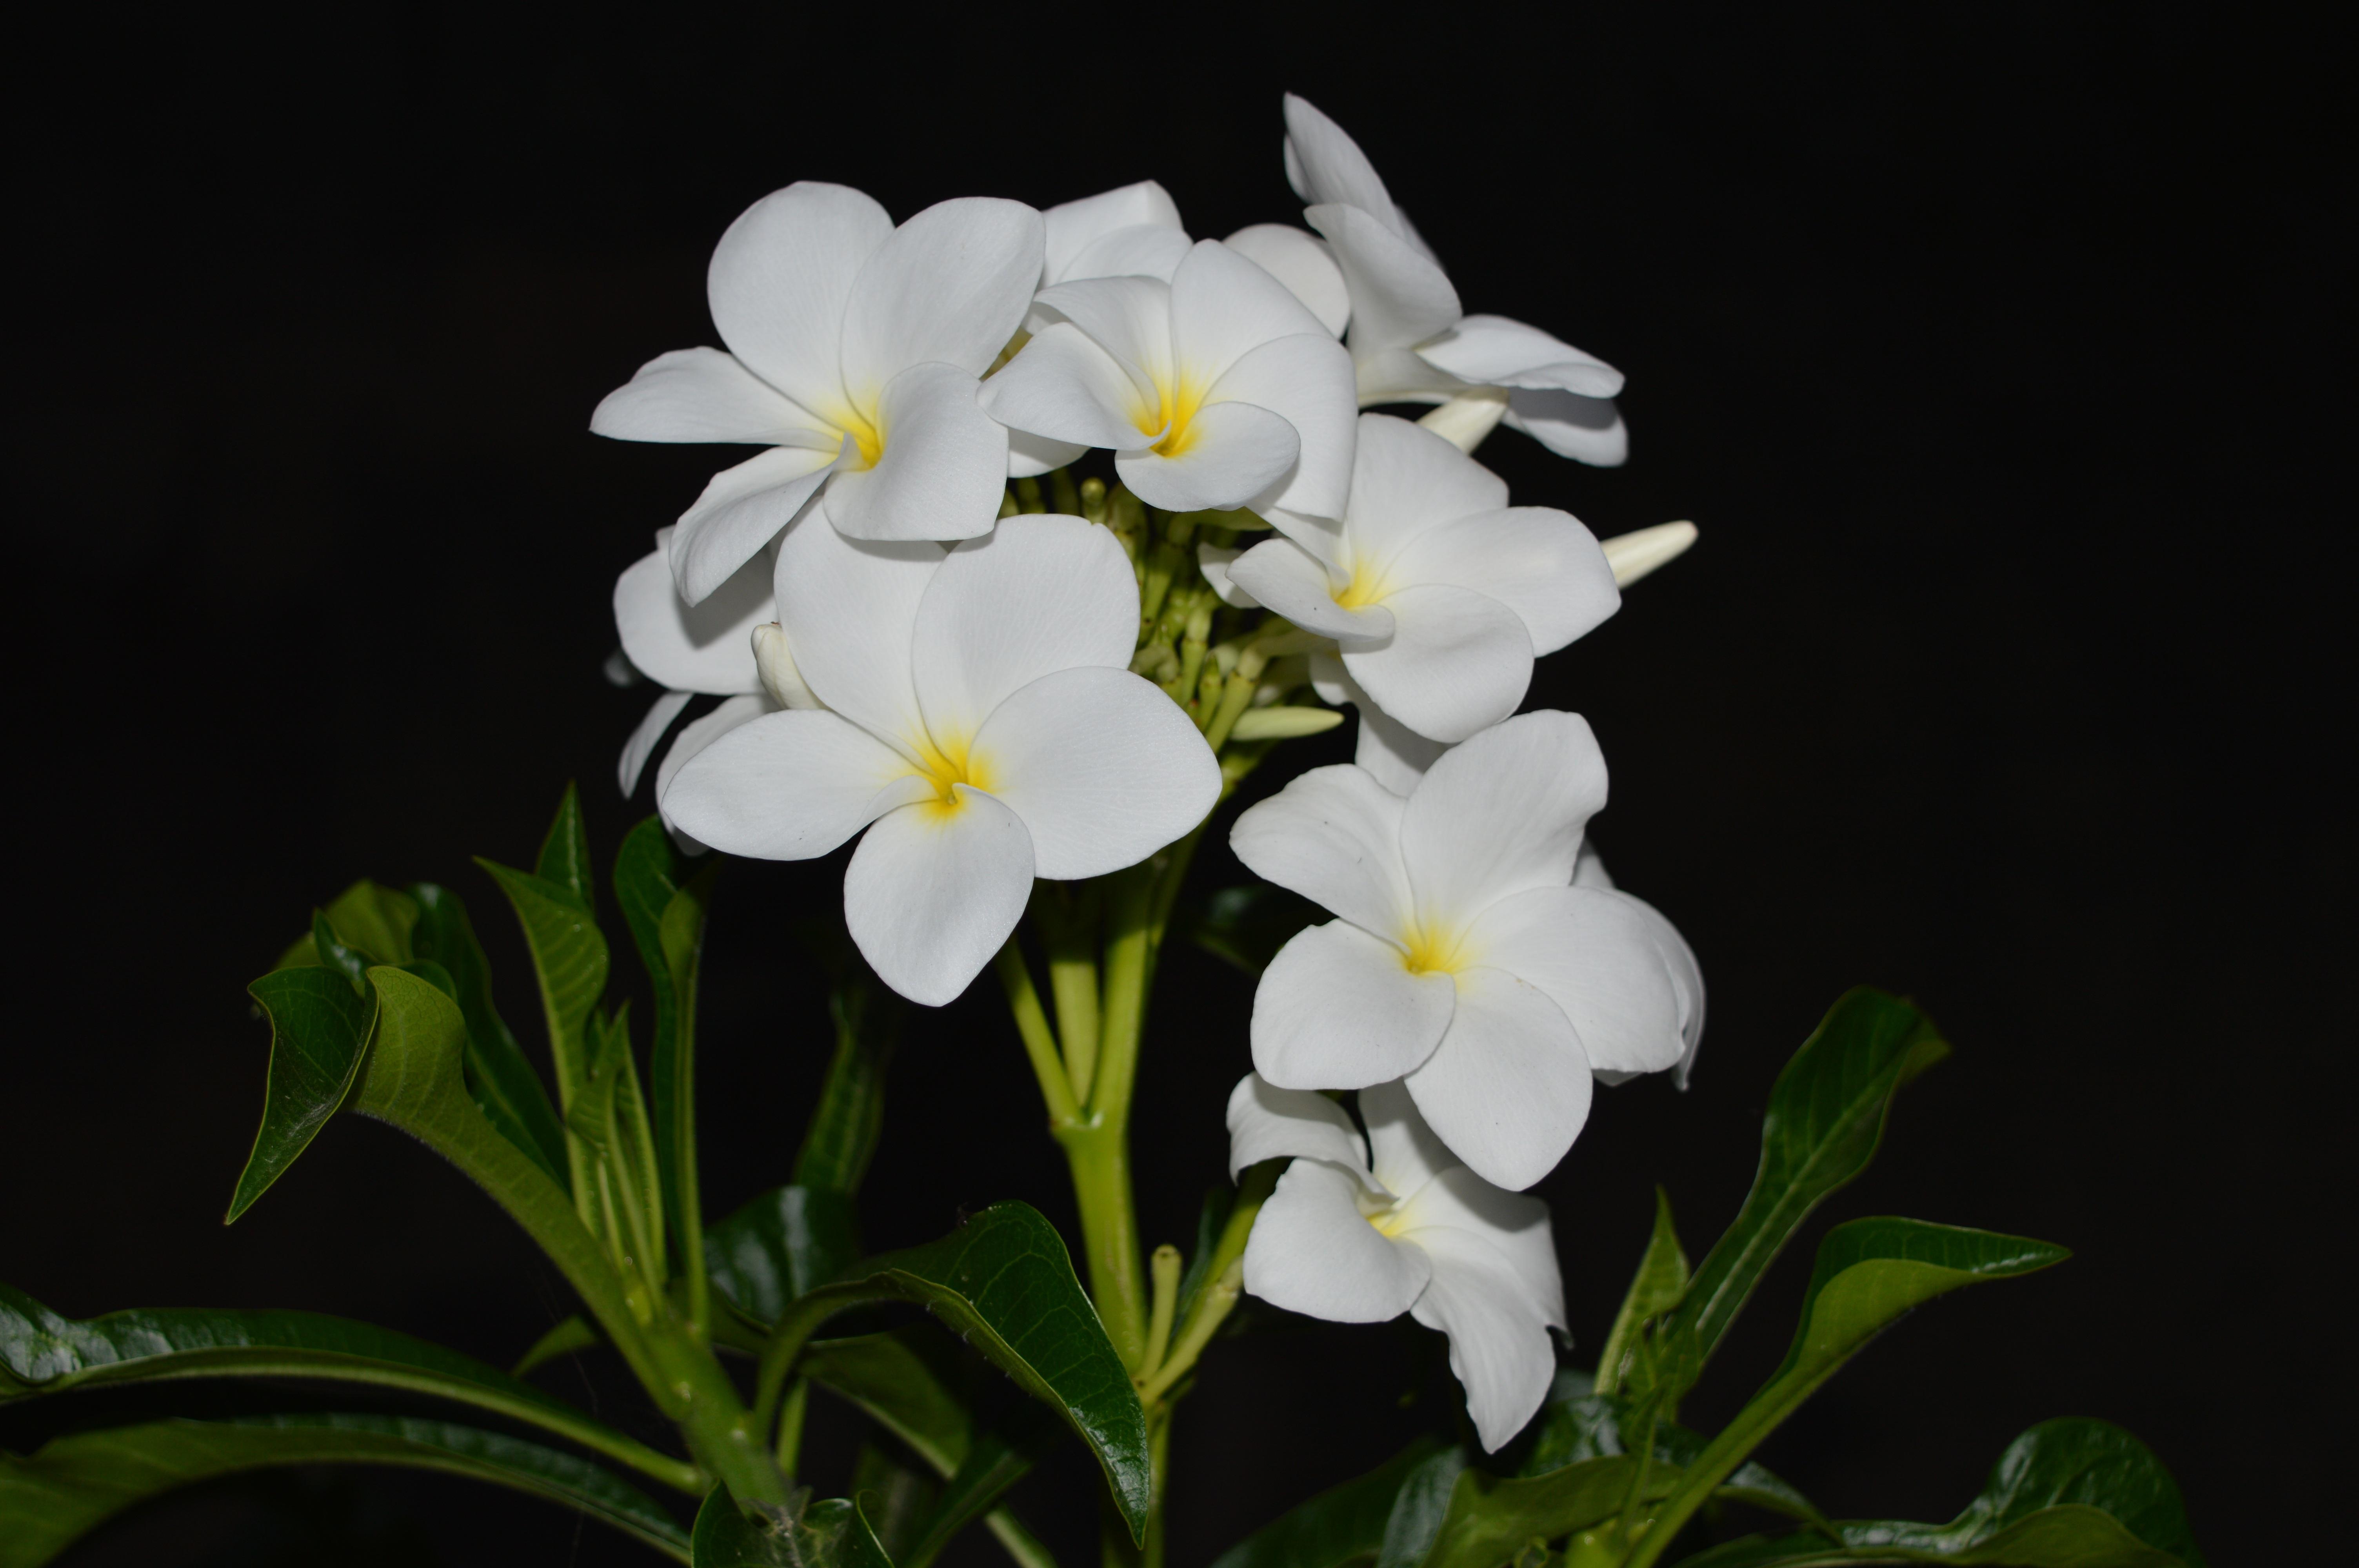 Free Images Nature Blossom Petal Green Botany Garden Flora